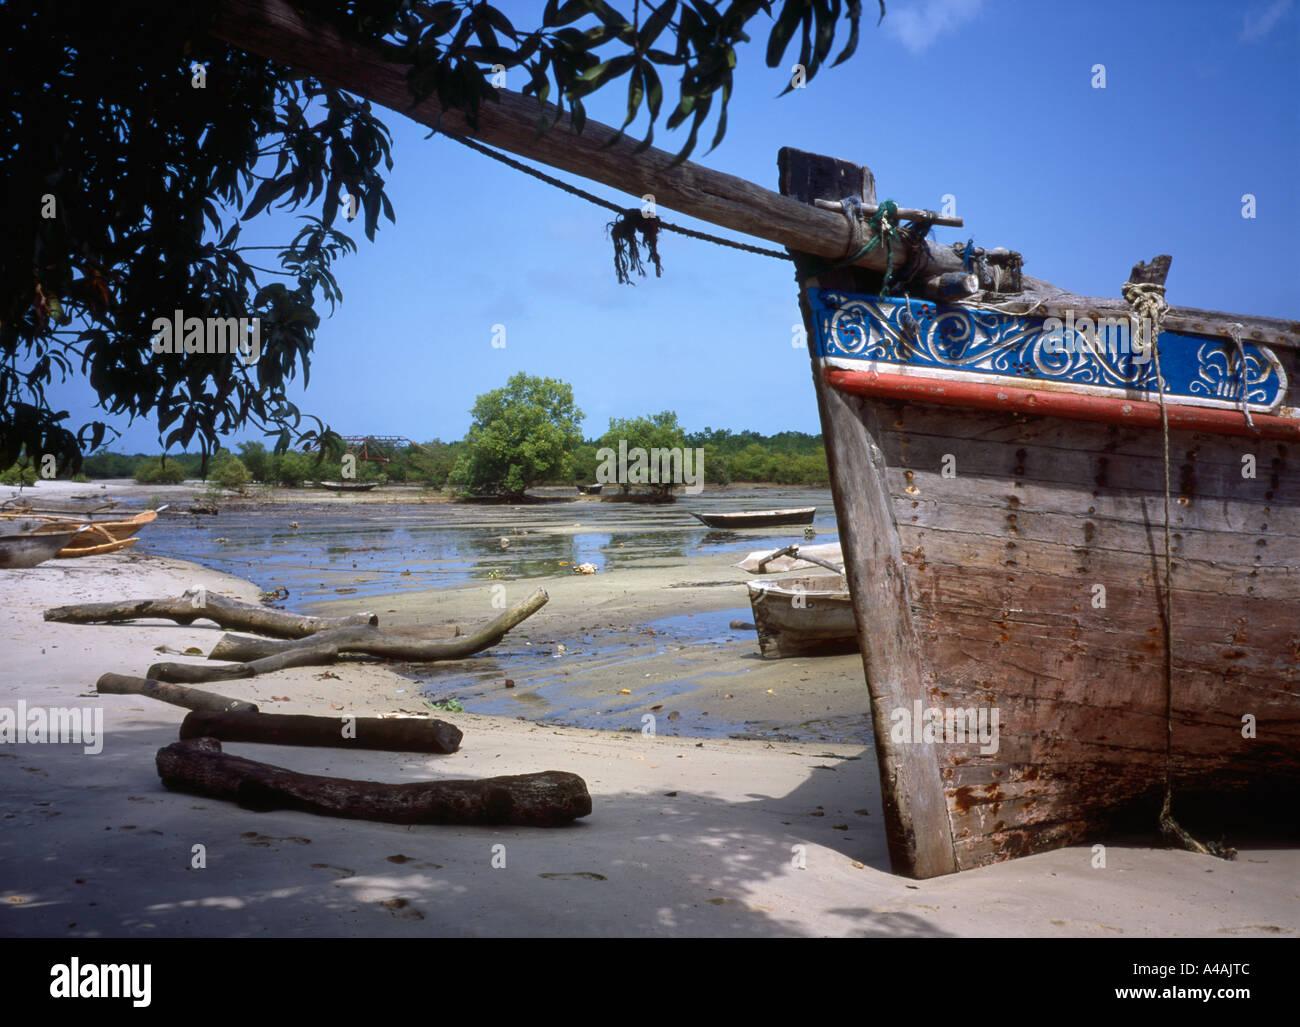 A Traditional Boatyard Building Wooden Boats On Zanzibar Stock Photo